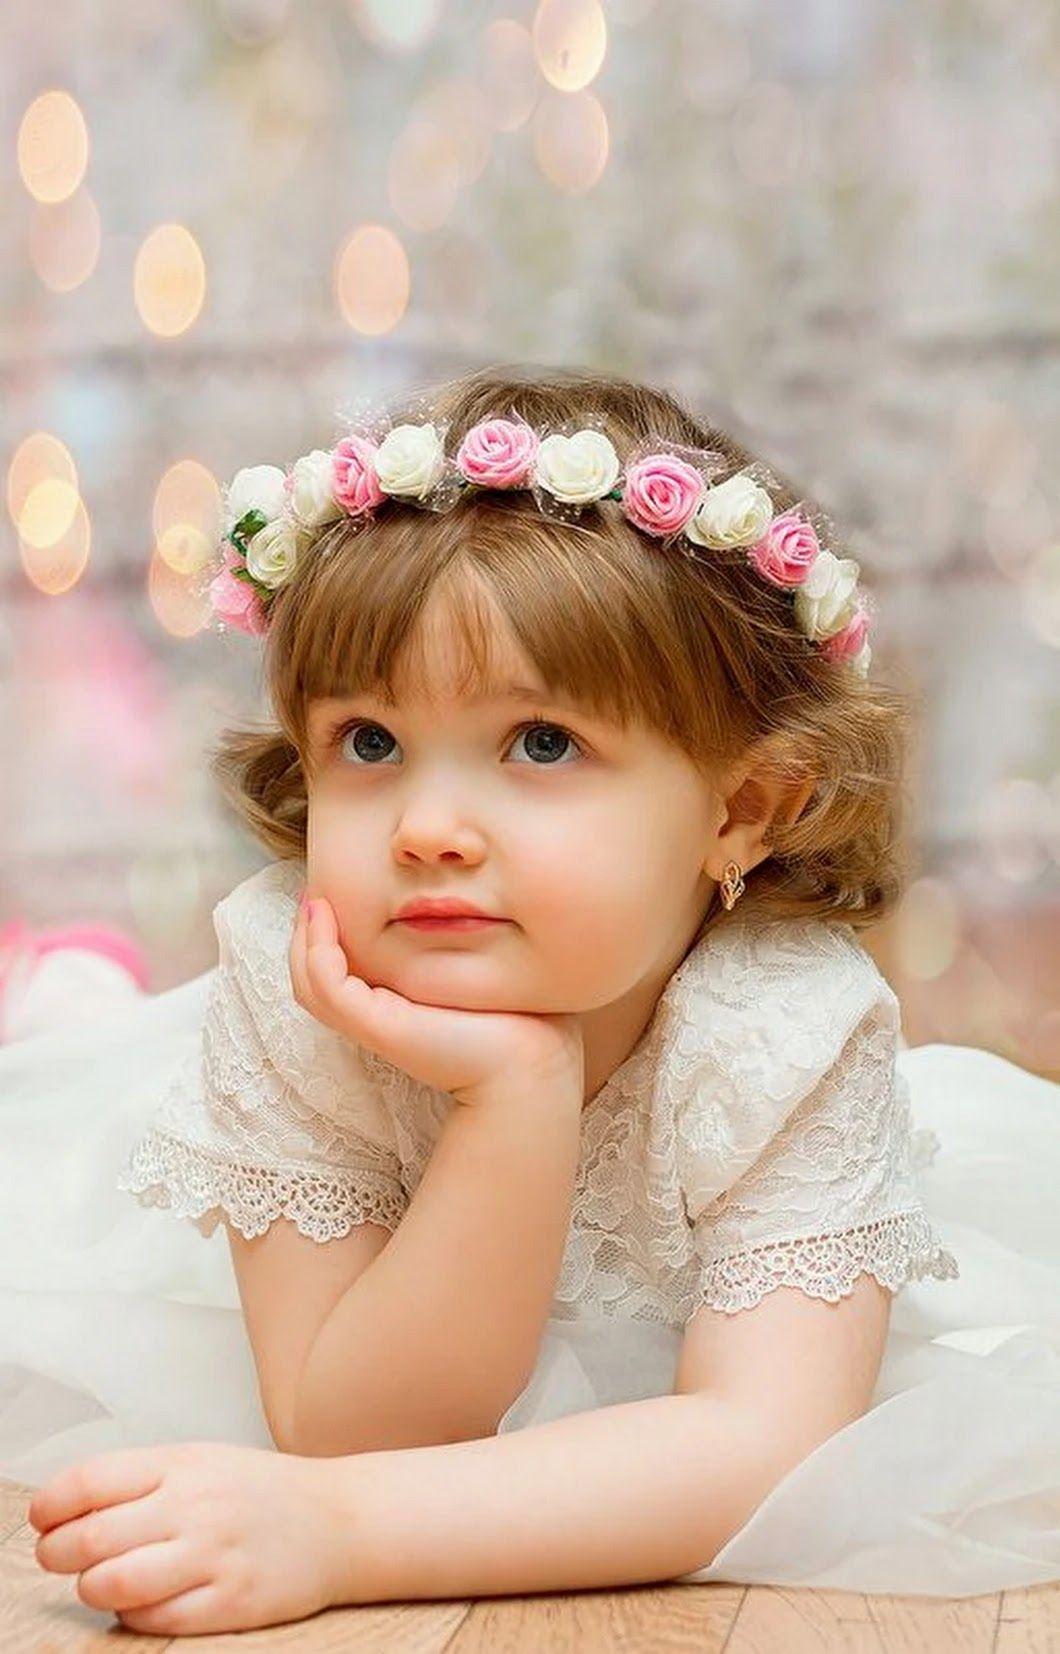 фотография Good Morning Good Night Cute Baby Pictures Cute